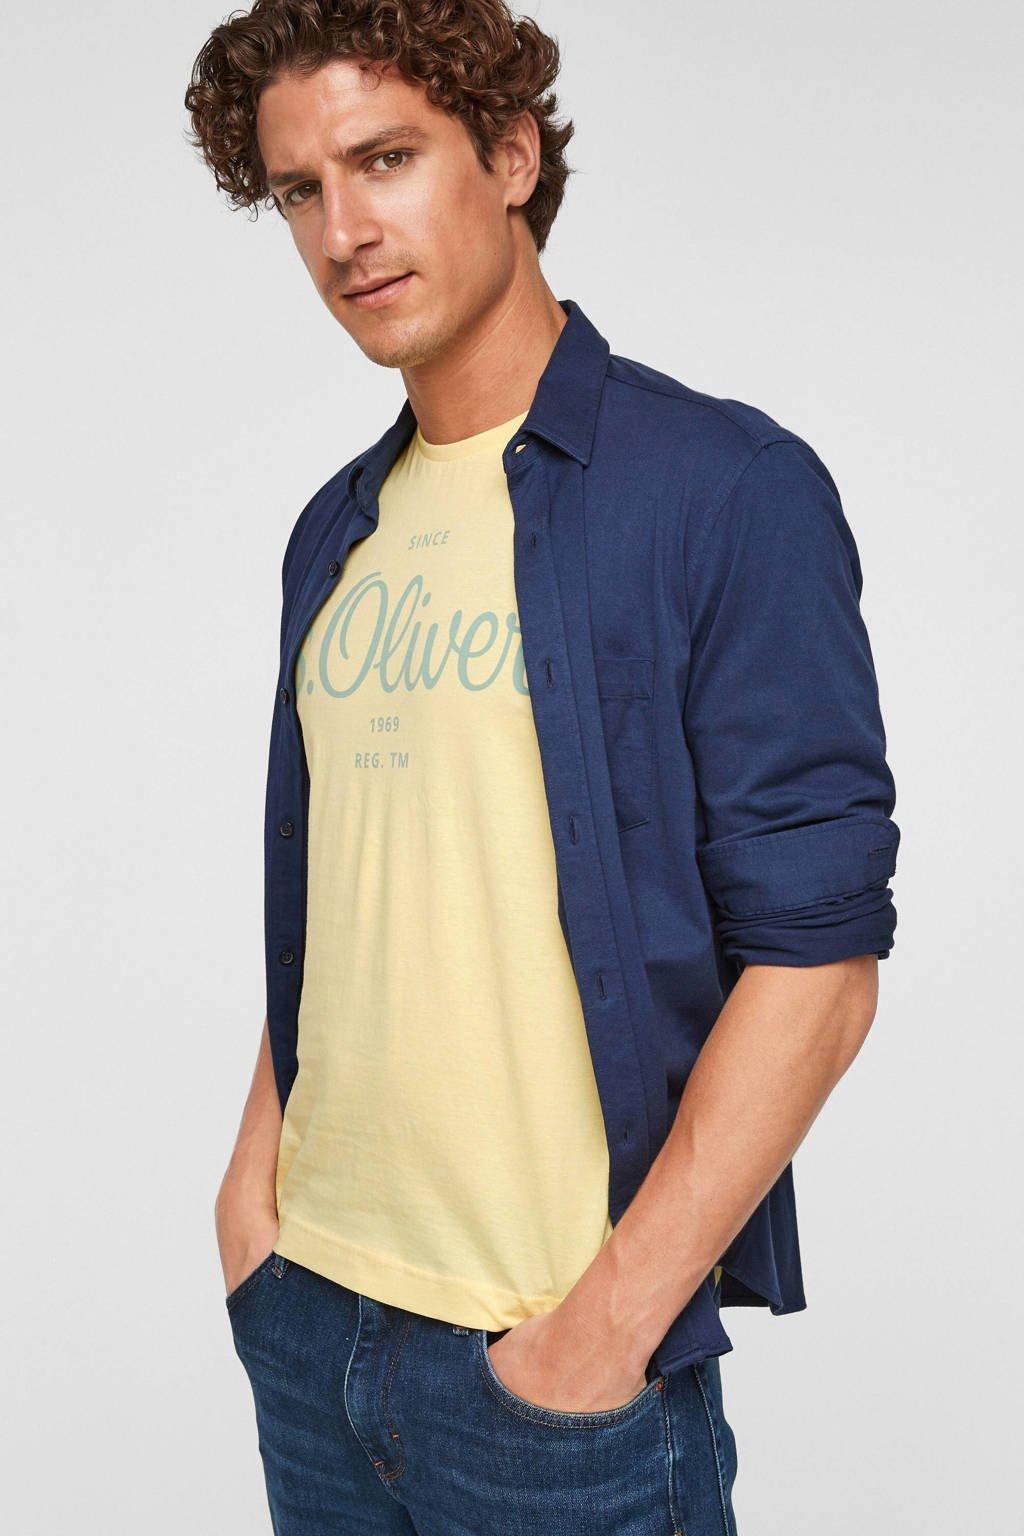 s.Oliver T-shirt met logo lichtgeel, Lichtgeel